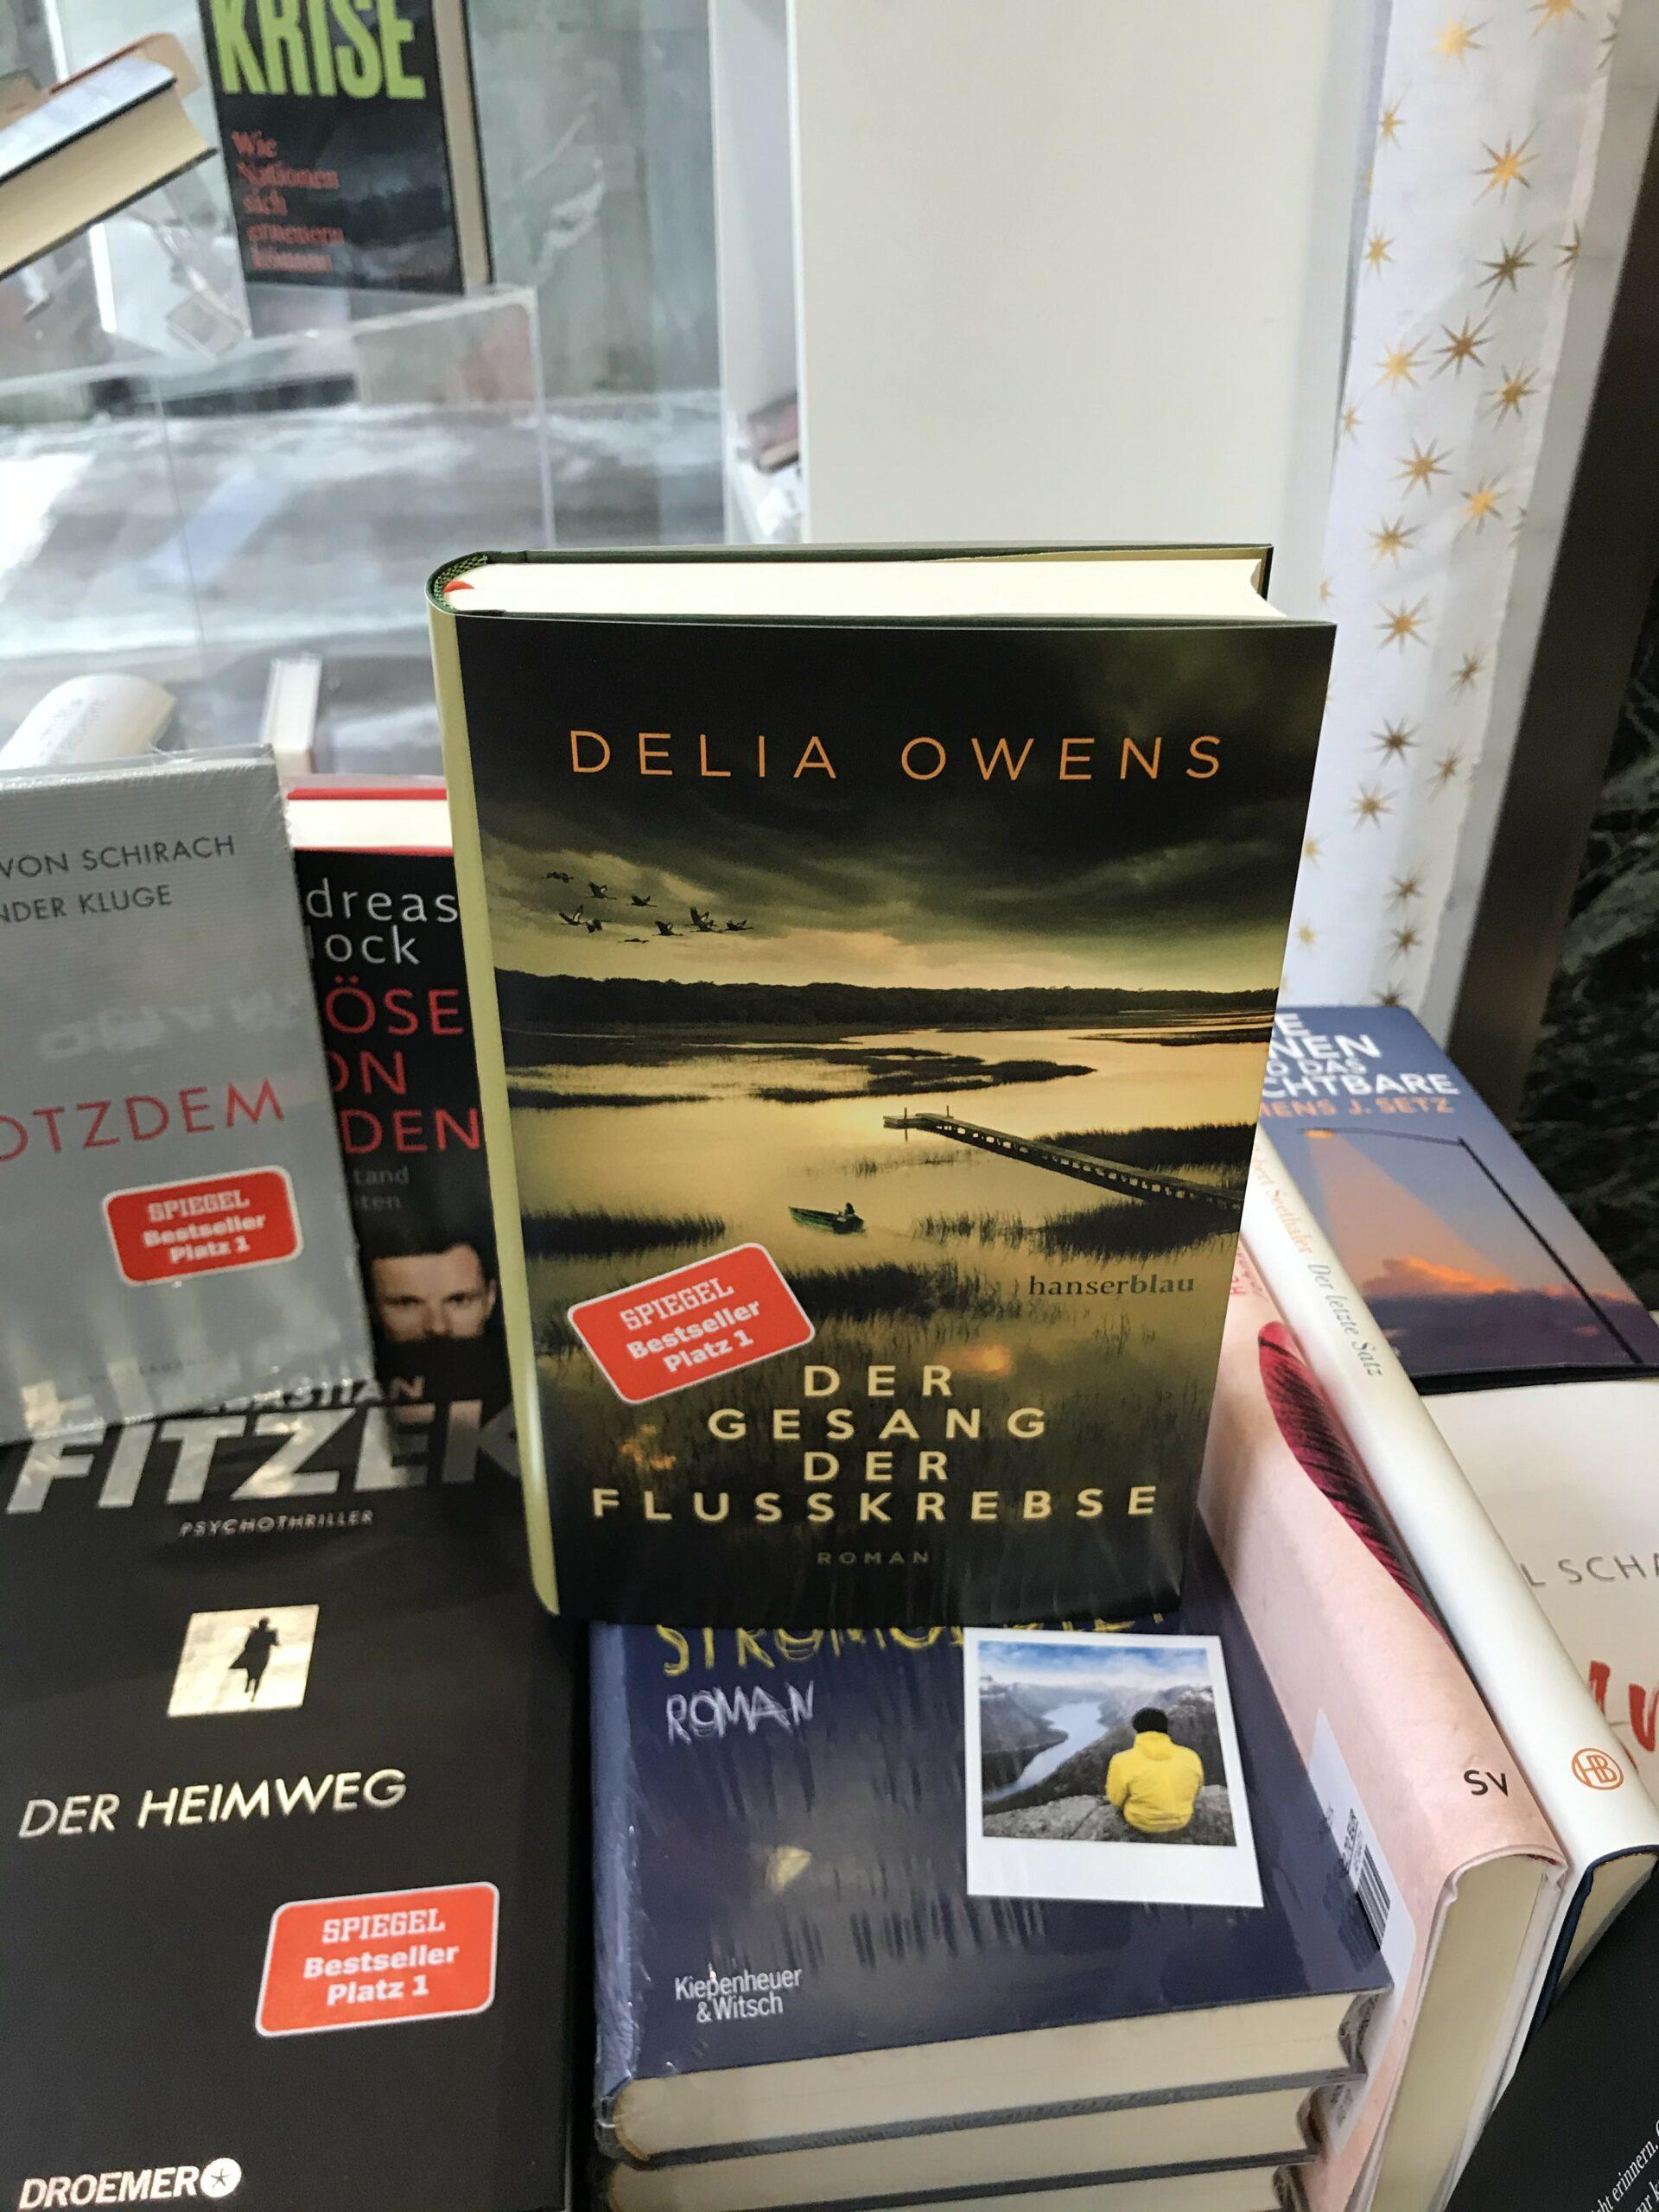 Der Gesang der Flusskrebse – Delia Owens